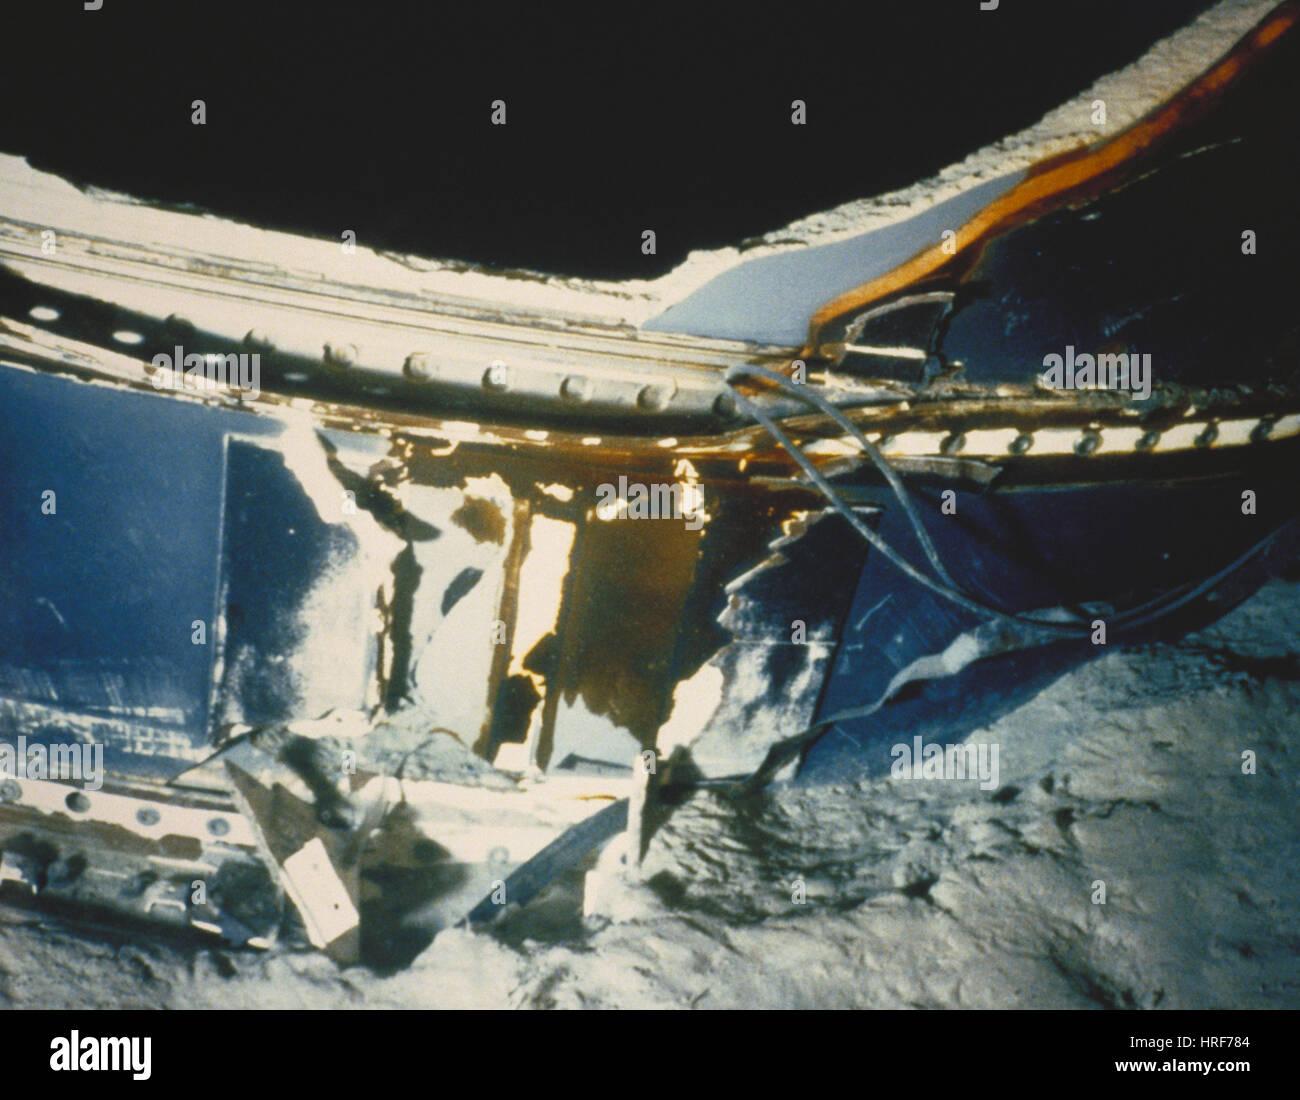 Challenger Shuttle Debris Stock Photo 134944660 Alamy